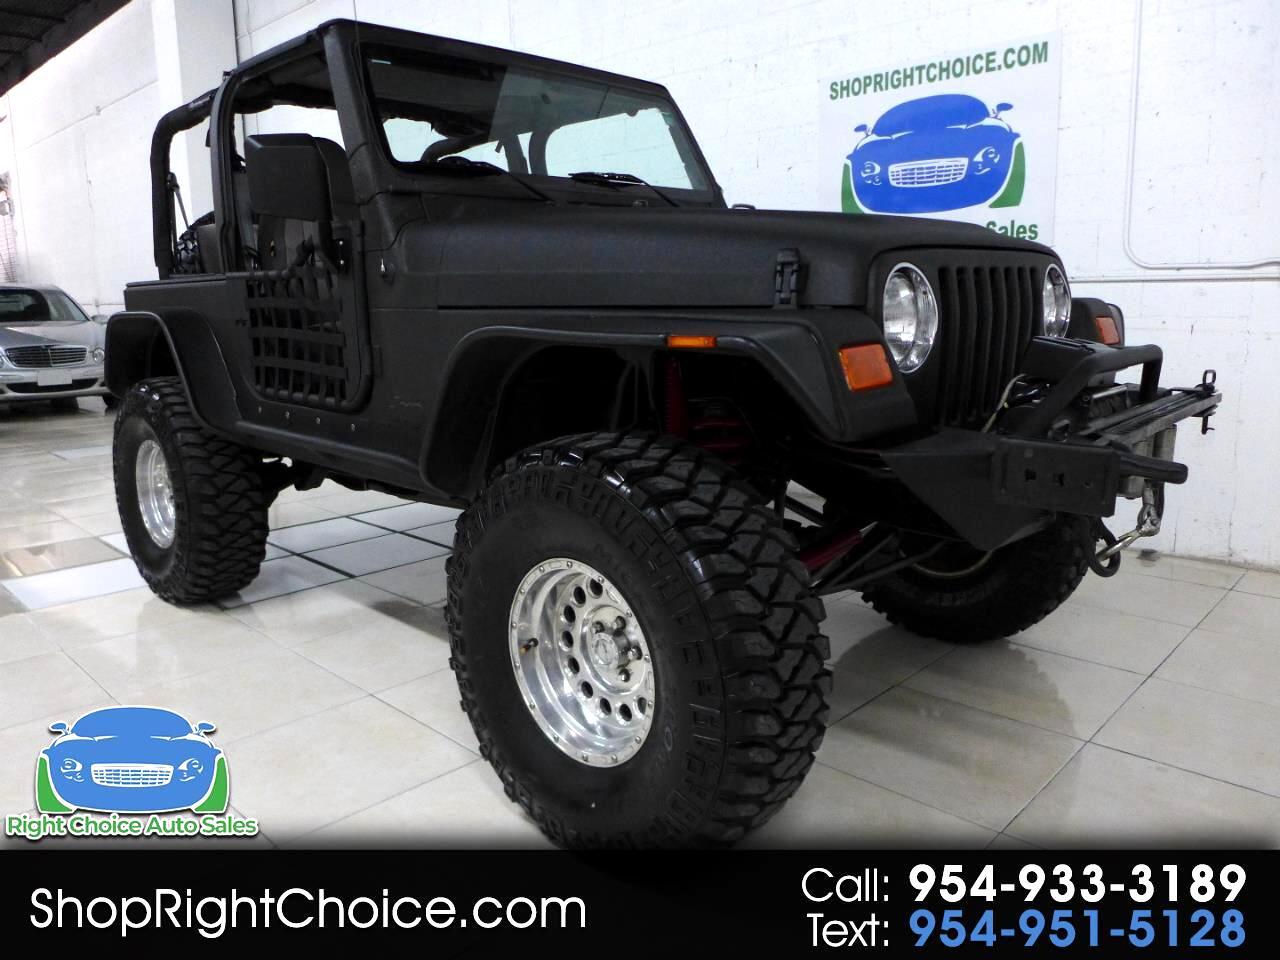 1998 Jeep Wrangler 4WD 2dr TJ